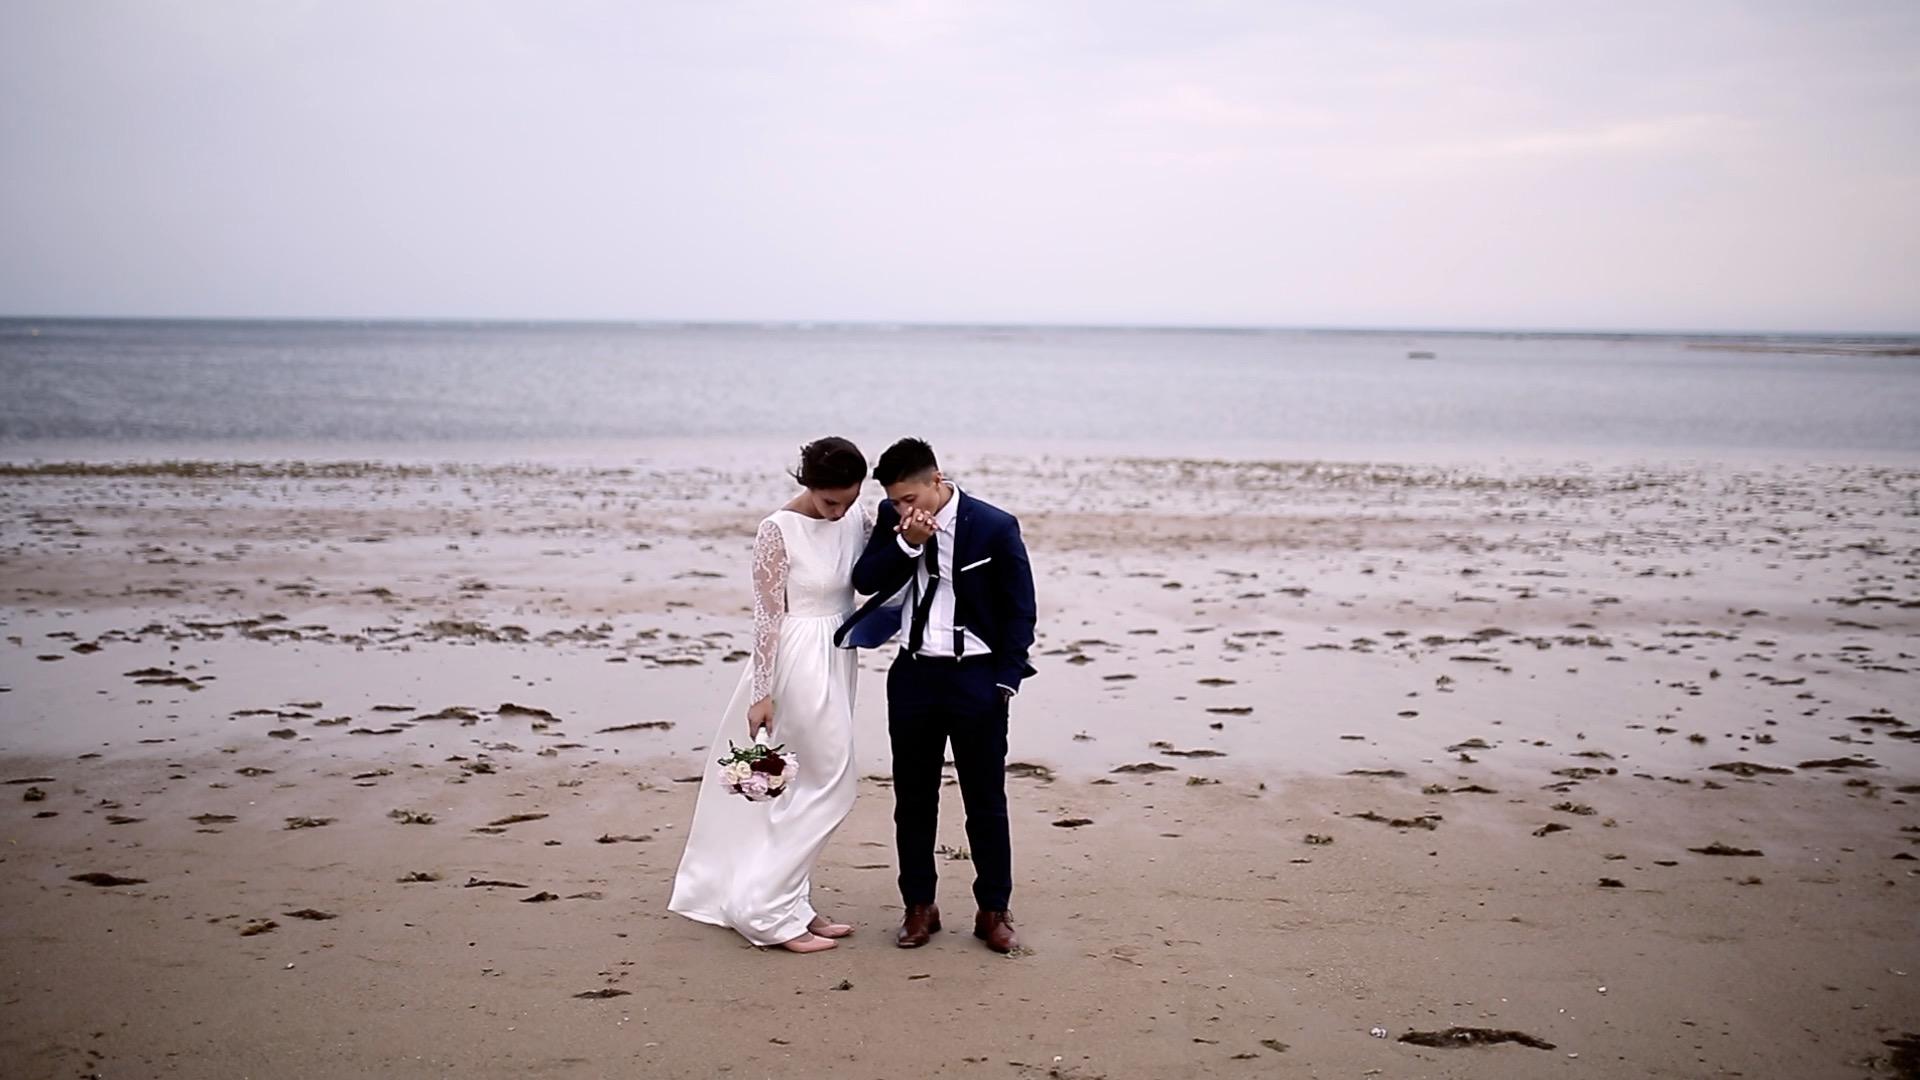 pareja en playa de rota, fénix visual.